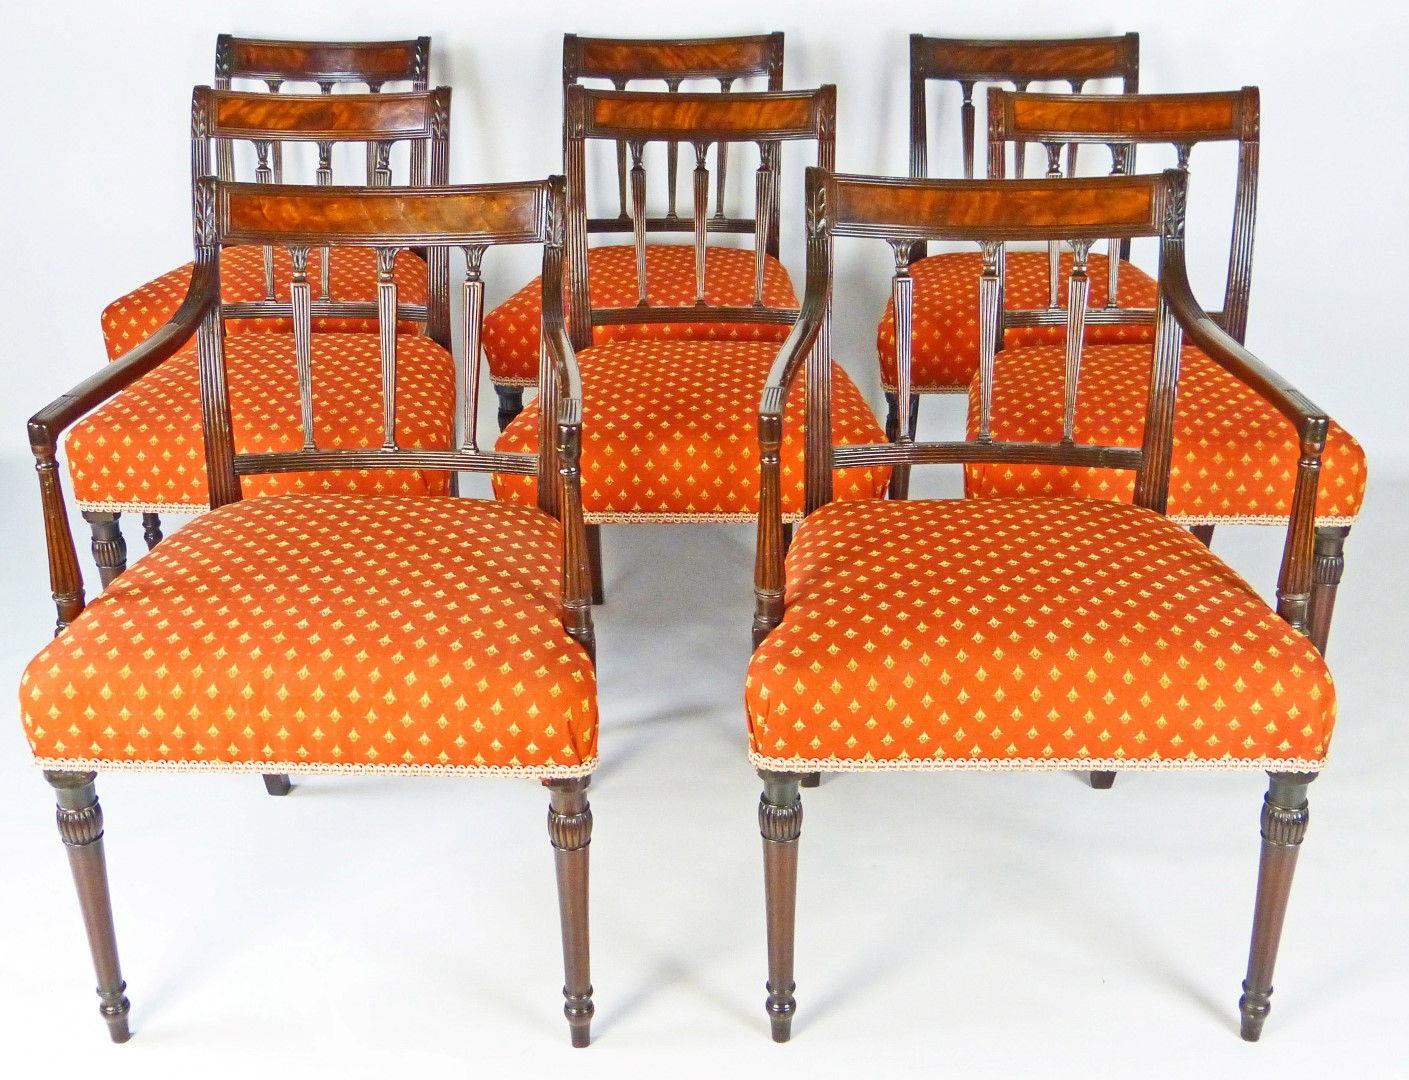 Muebles antiguos armarios antiguos mesas antiguas for Sillas comodas comedor